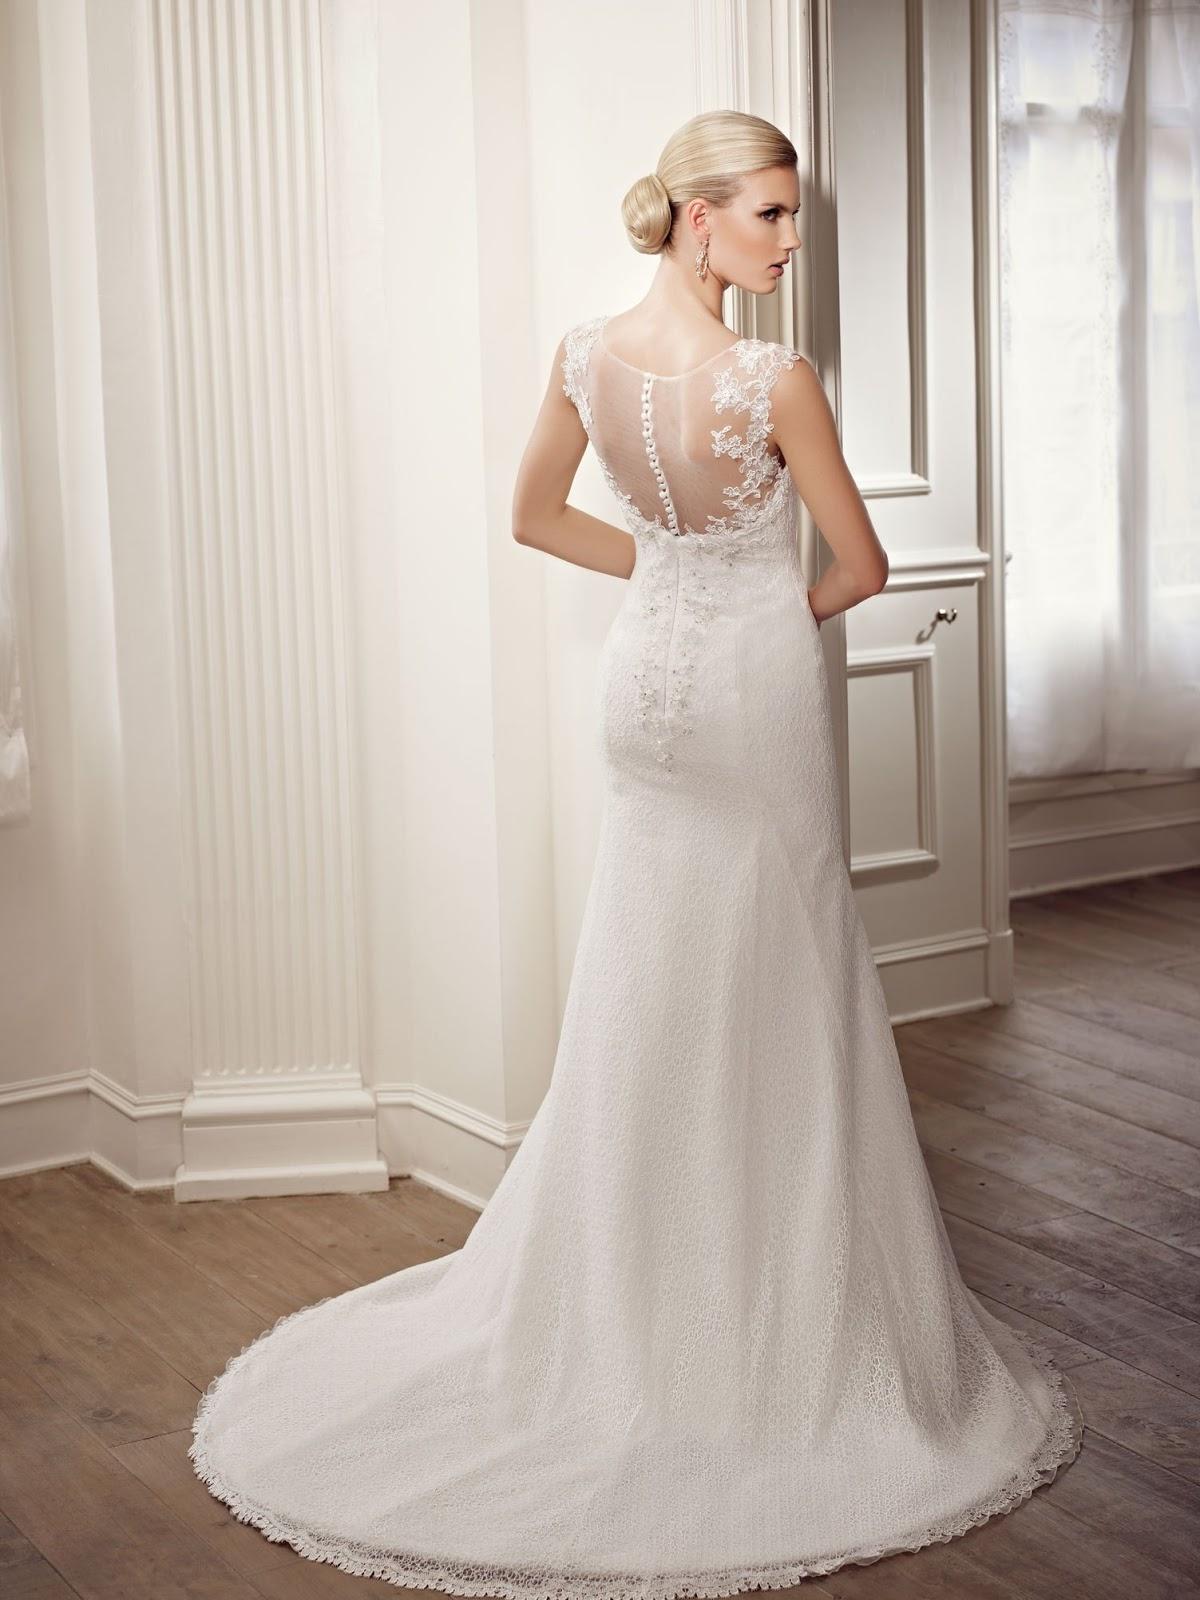 Elianna Moore 2014 Spring Bridal Collection